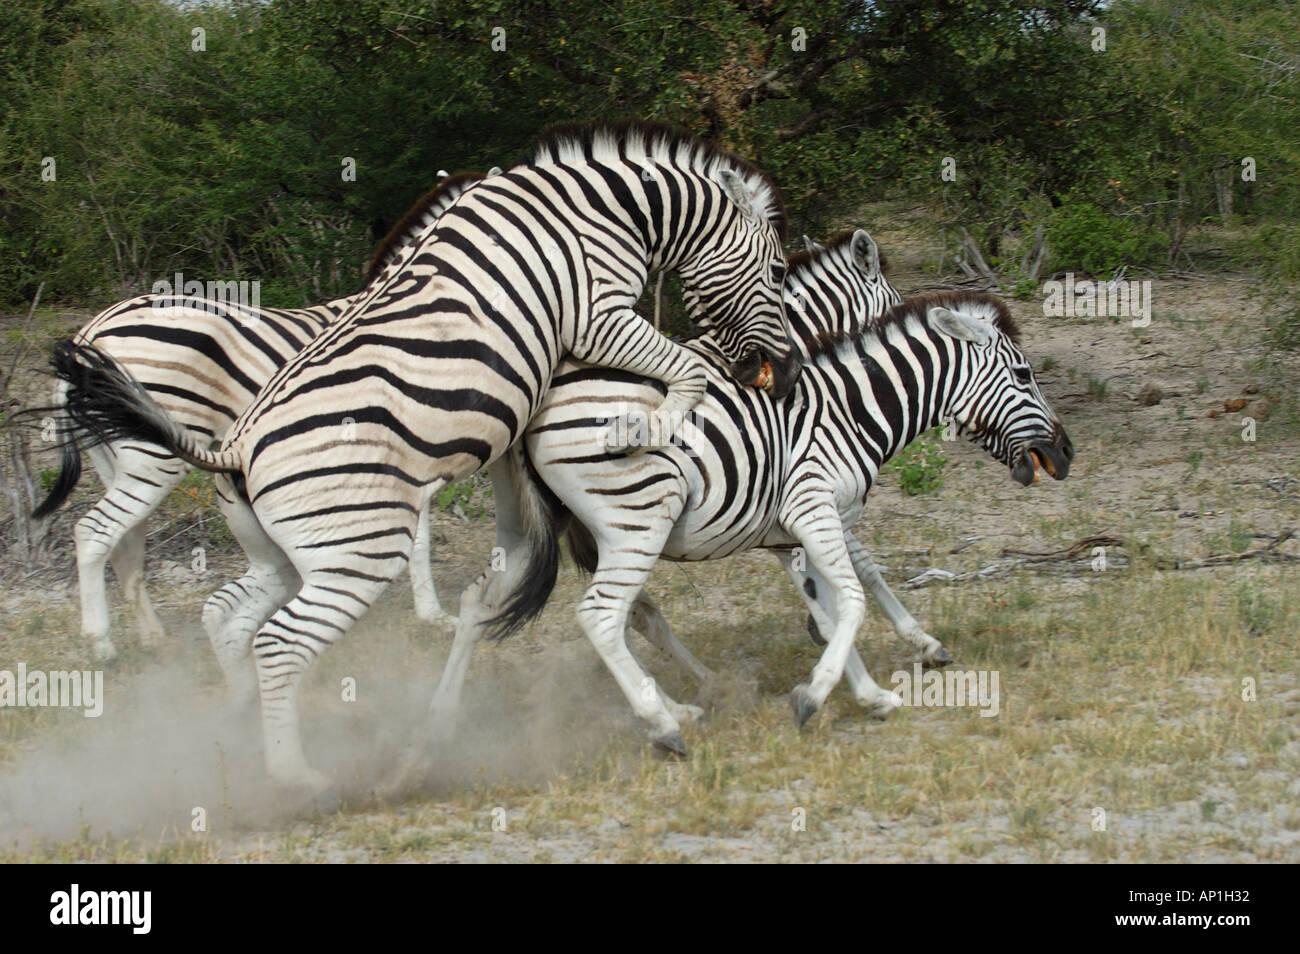 Zebras mating - photo#48